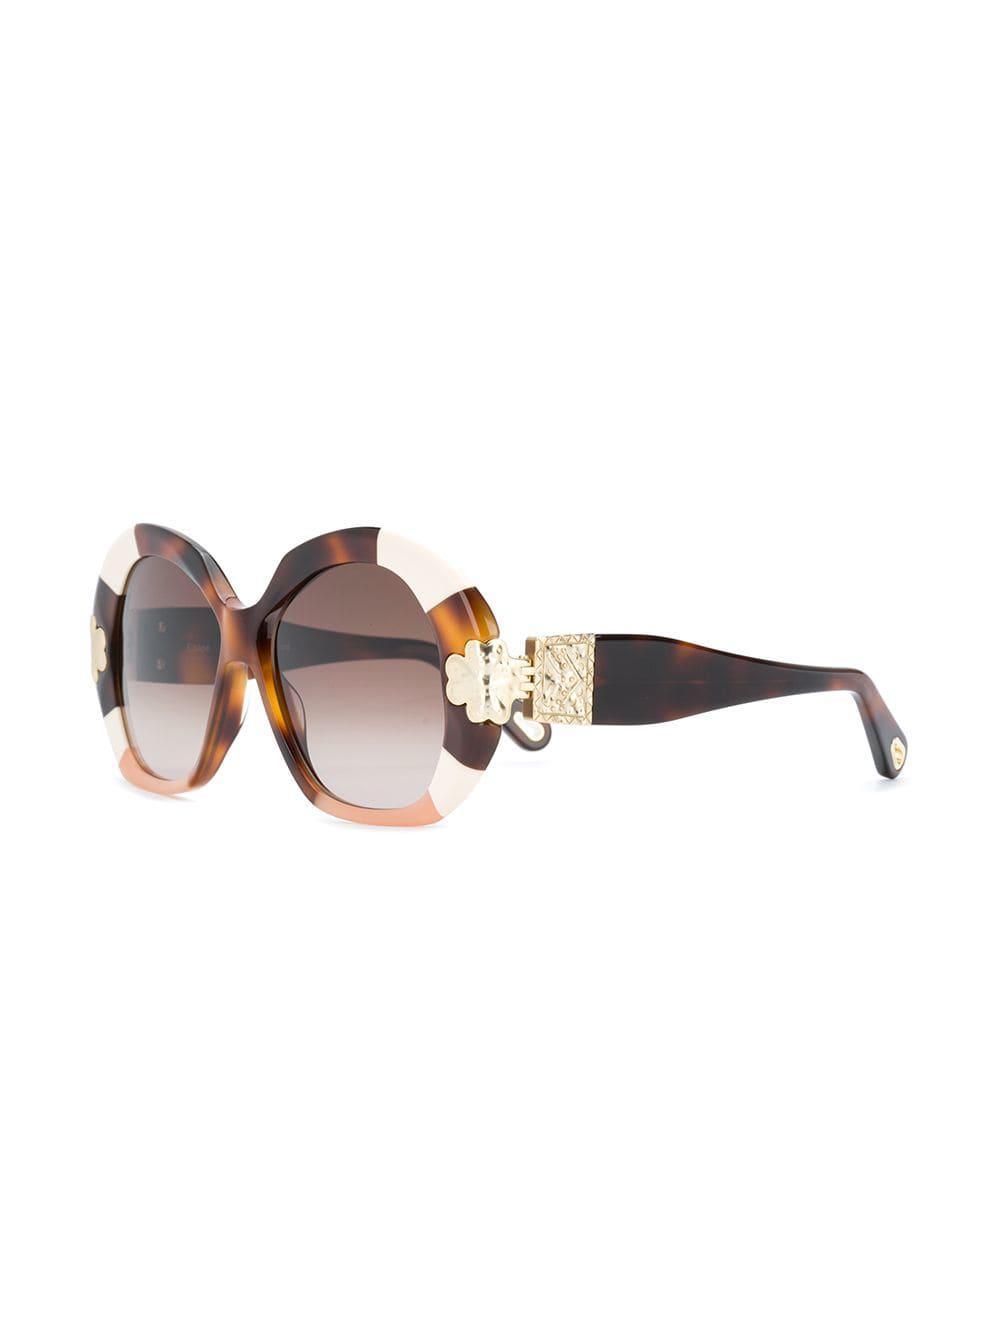 0b3a57b7647 Chloé - Brown Tortoiseshell Oversized Sunglasses - Lyst. View fullscreen